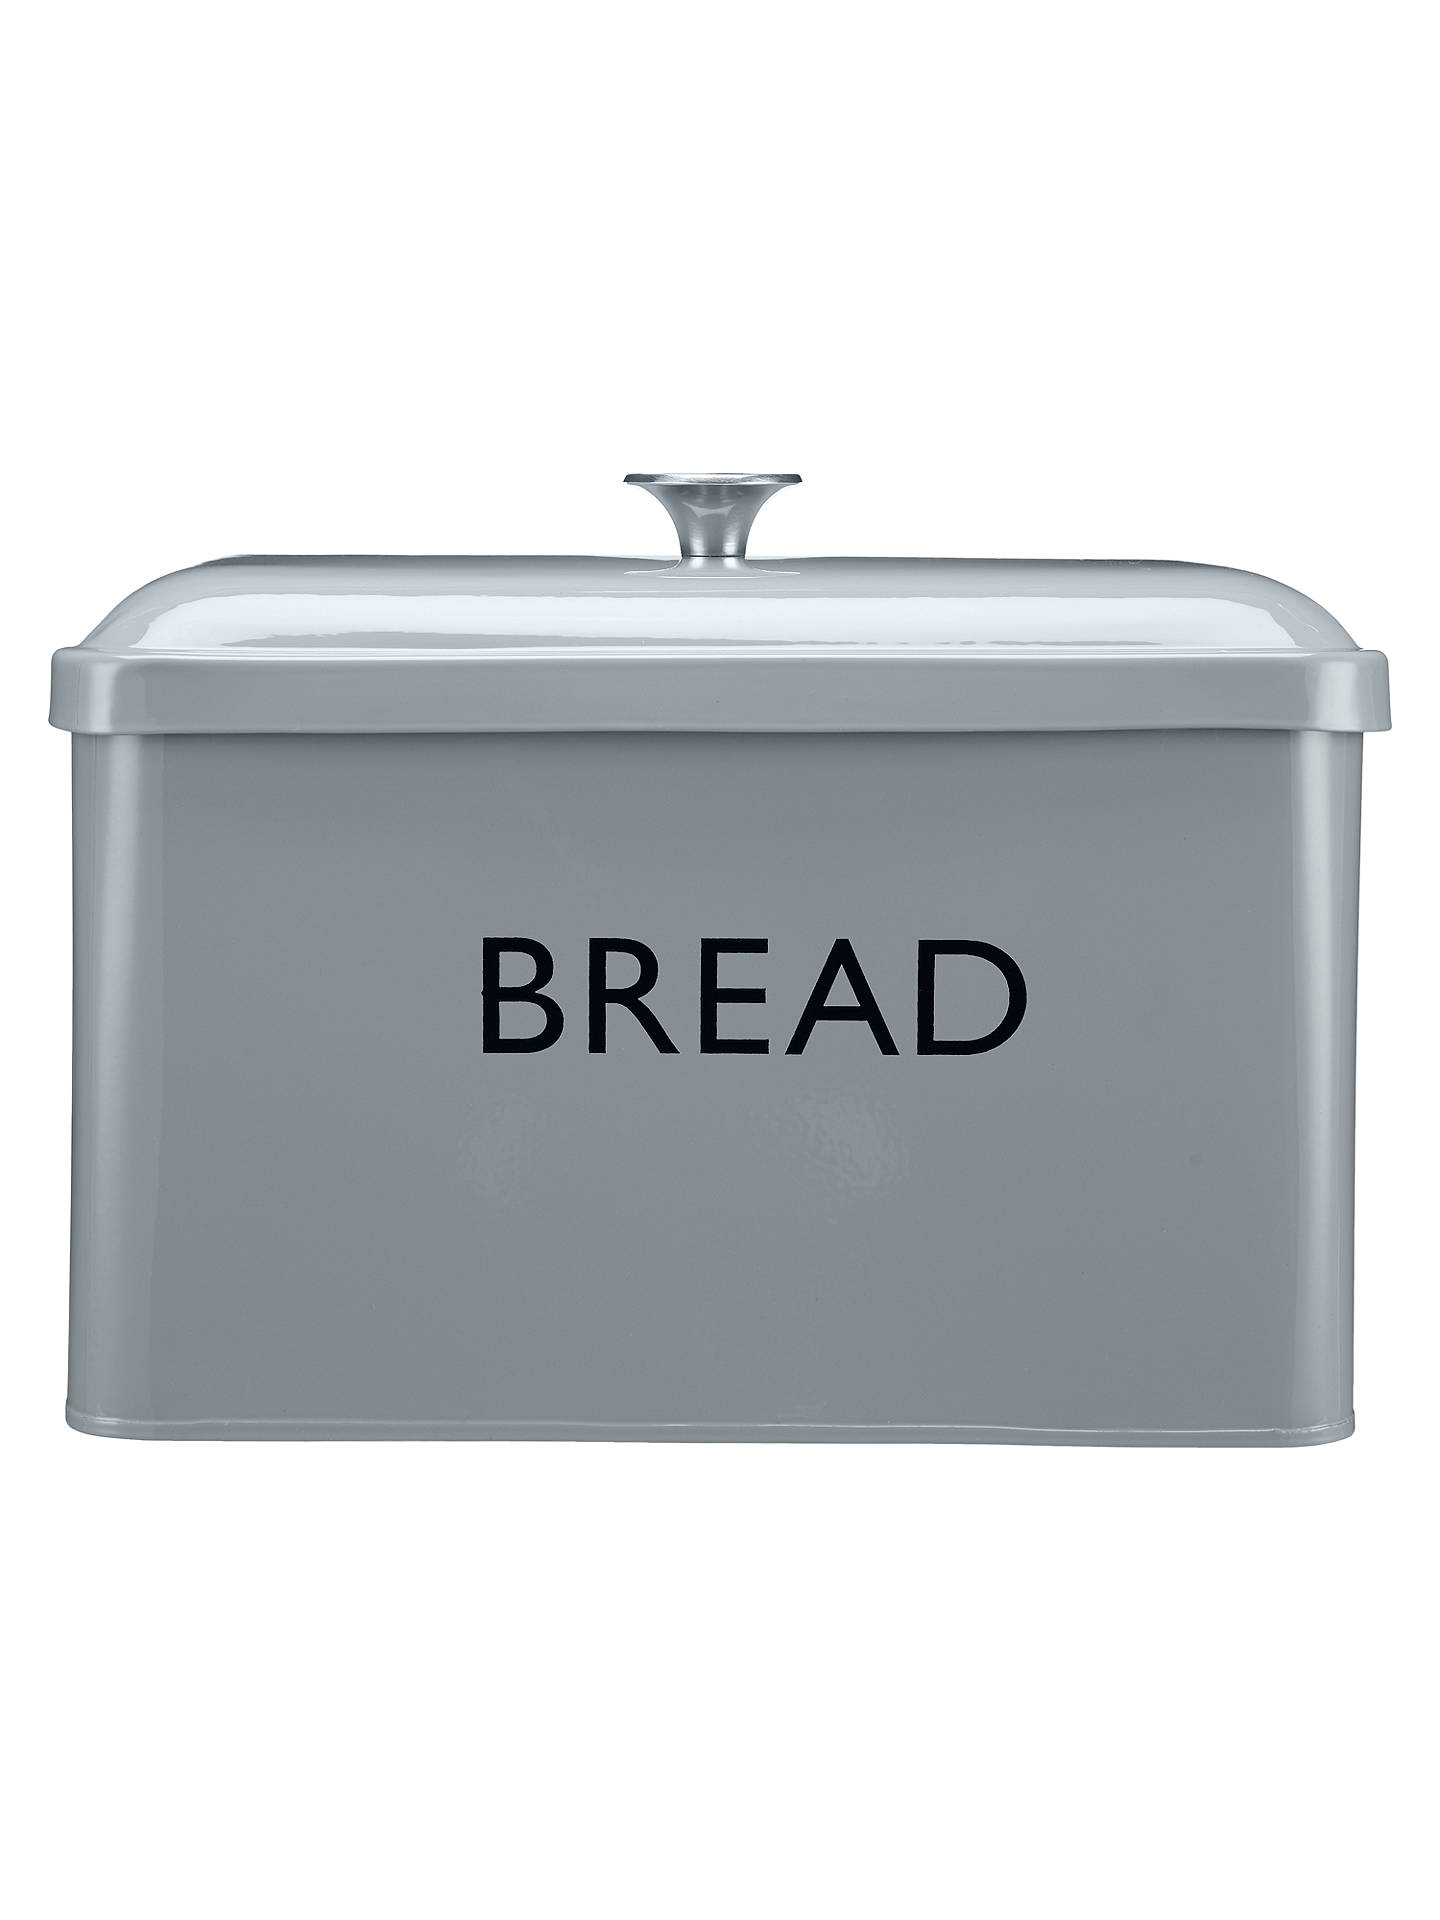 john lewis partners enamel bread bin at john lewis. Black Bedroom Furniture Sets. Home Design Ideas